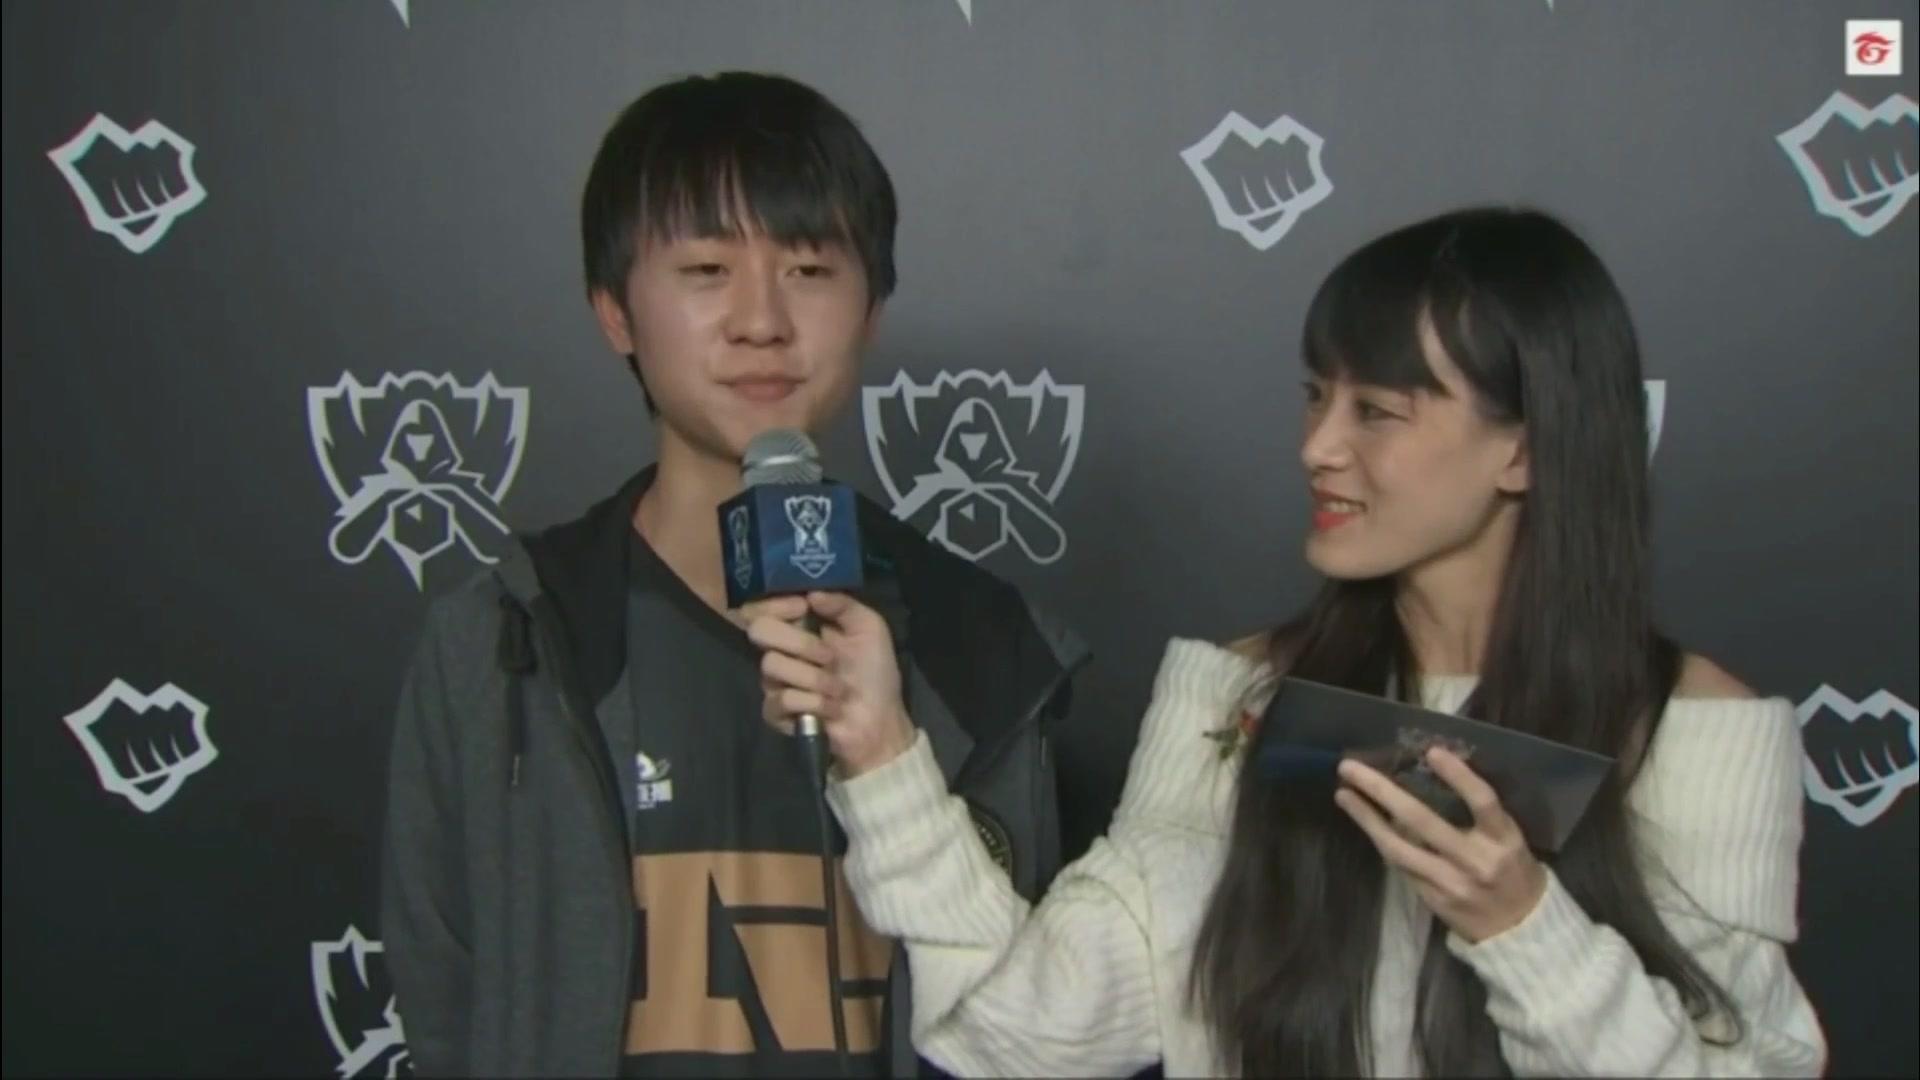 【RNG.S7】Day6-小明接受臺灣媒體采訪_電子競技_游戲_bilibili_嗶哩嗶哩